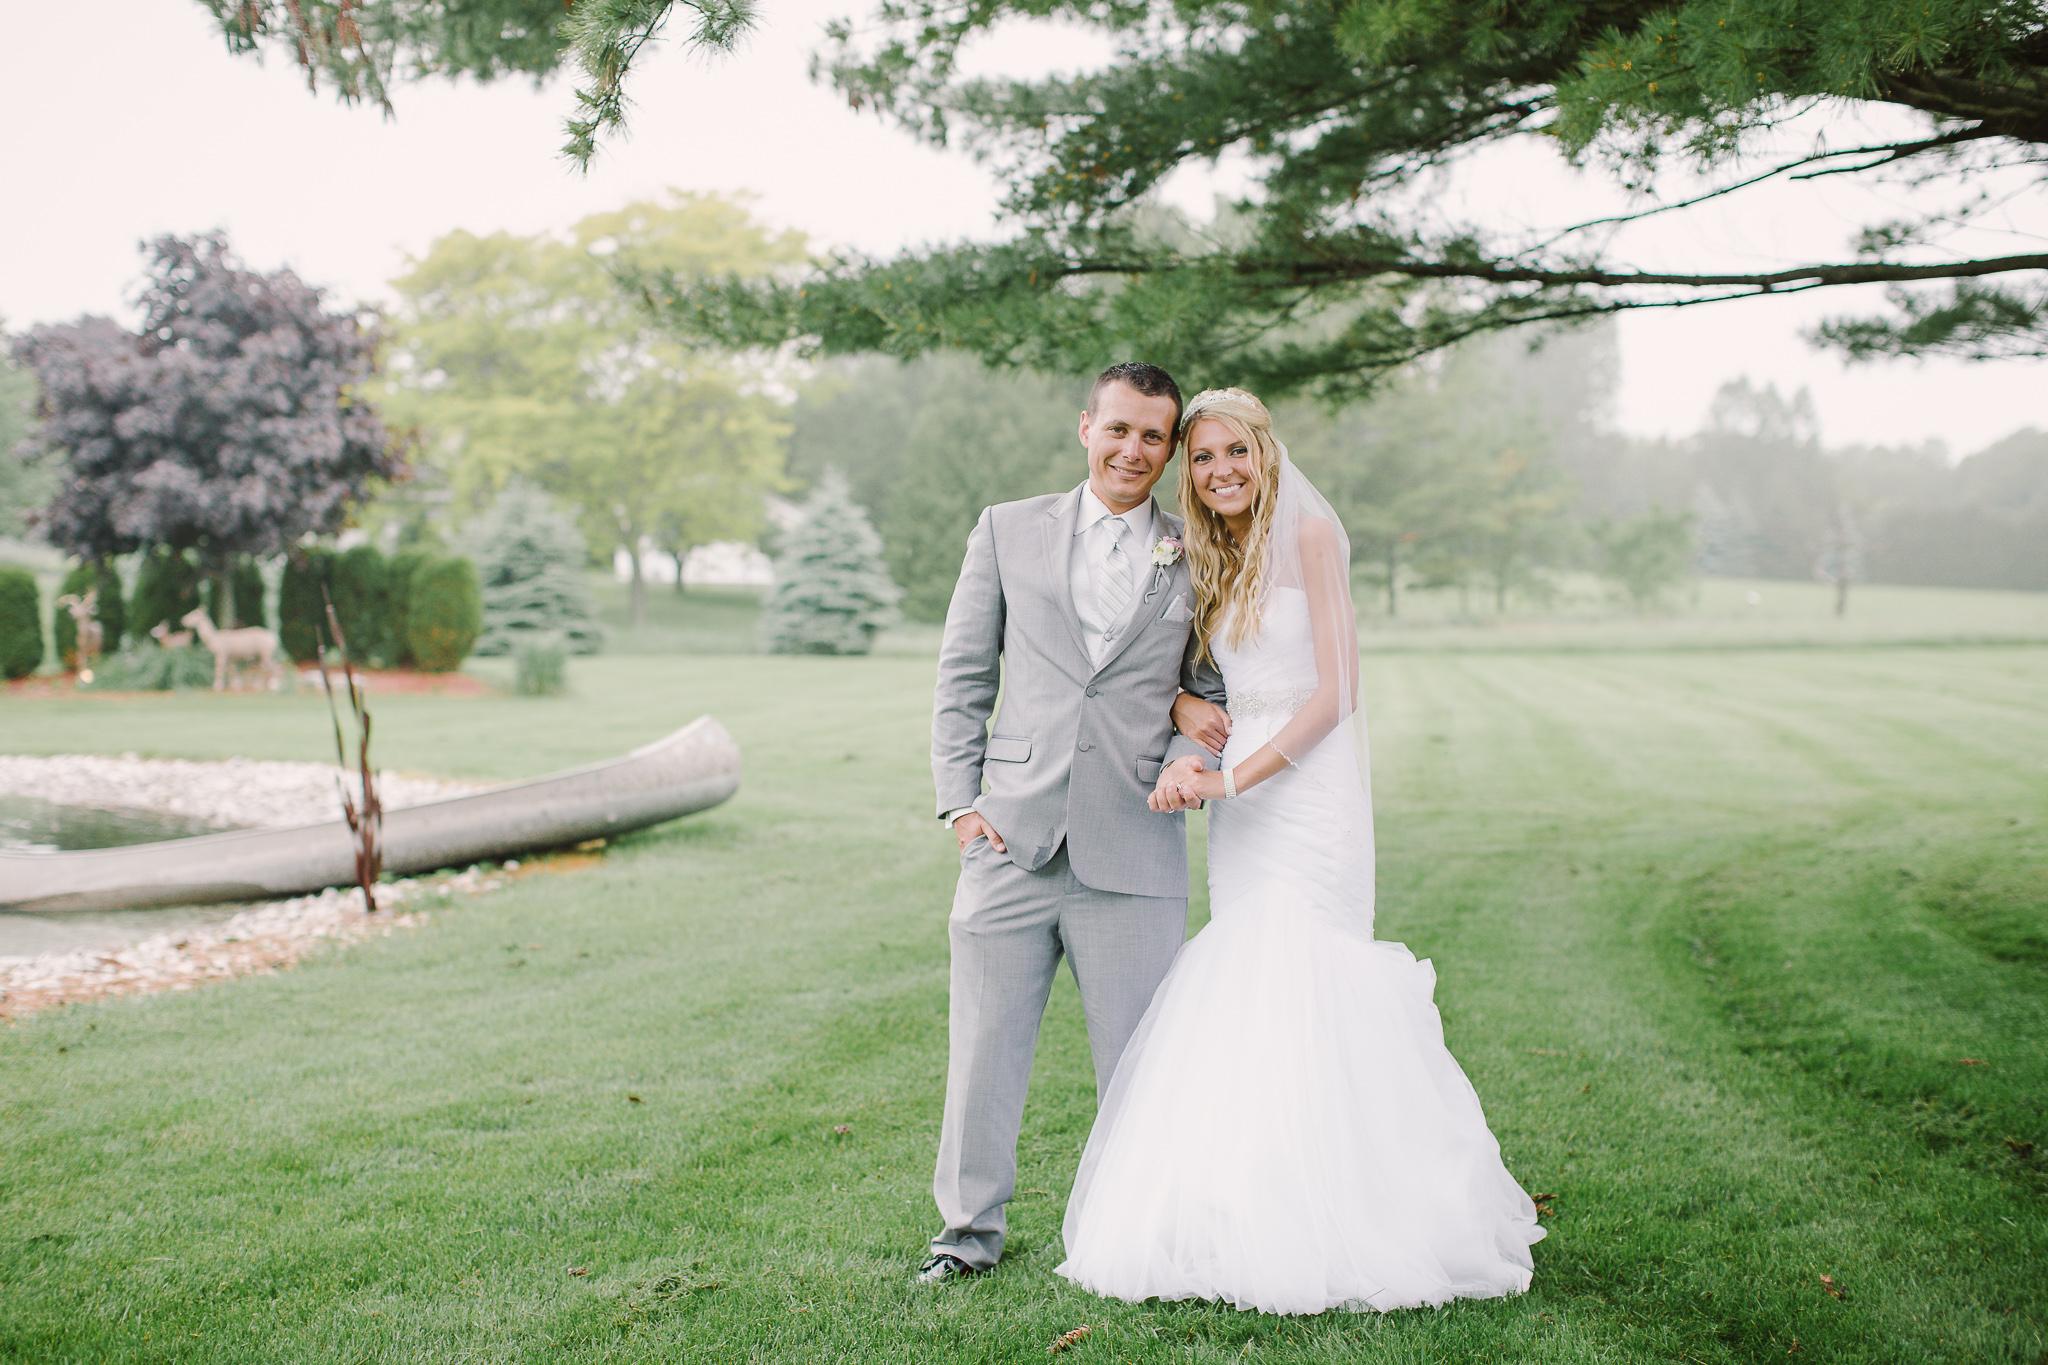 Knox's Silver Valley Manitowoc WI Wedding Photos